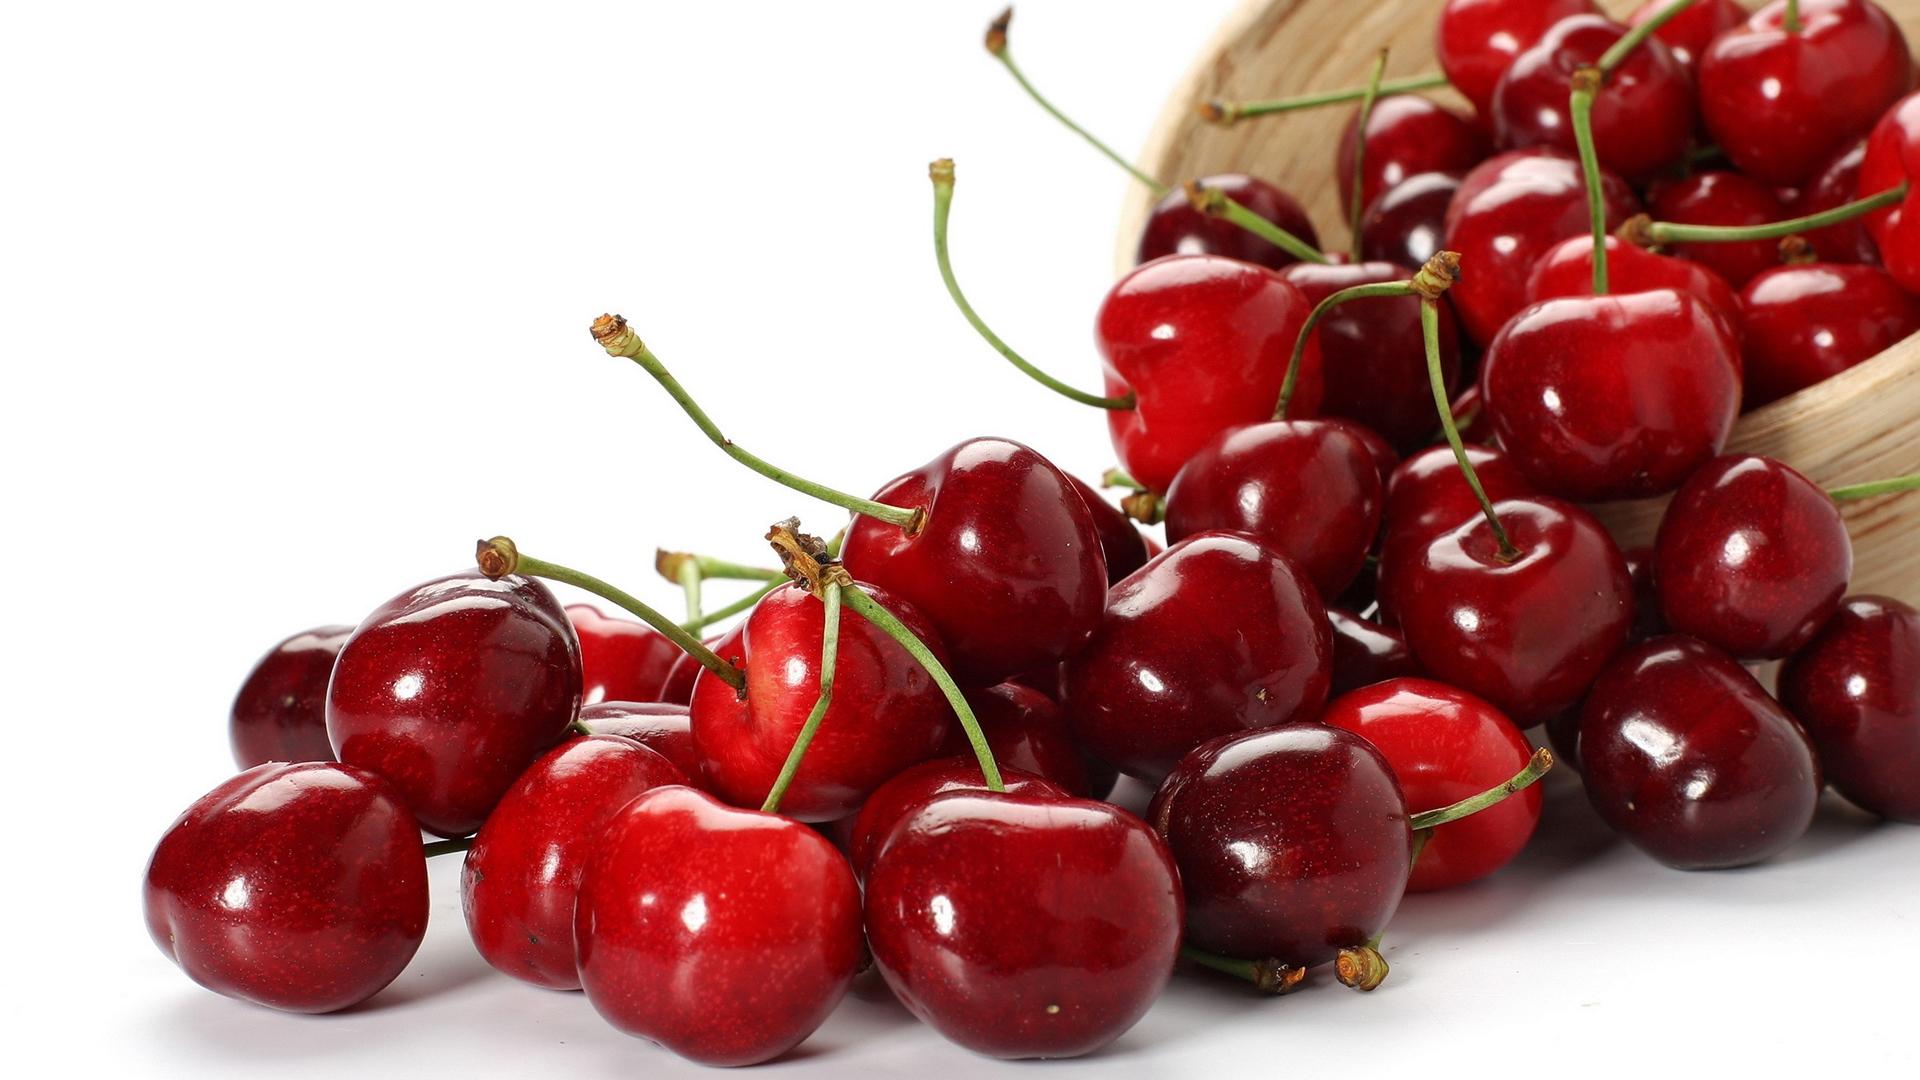 vi-sao-nguoi-bi-gout-nen-an-cherry-1.jpg